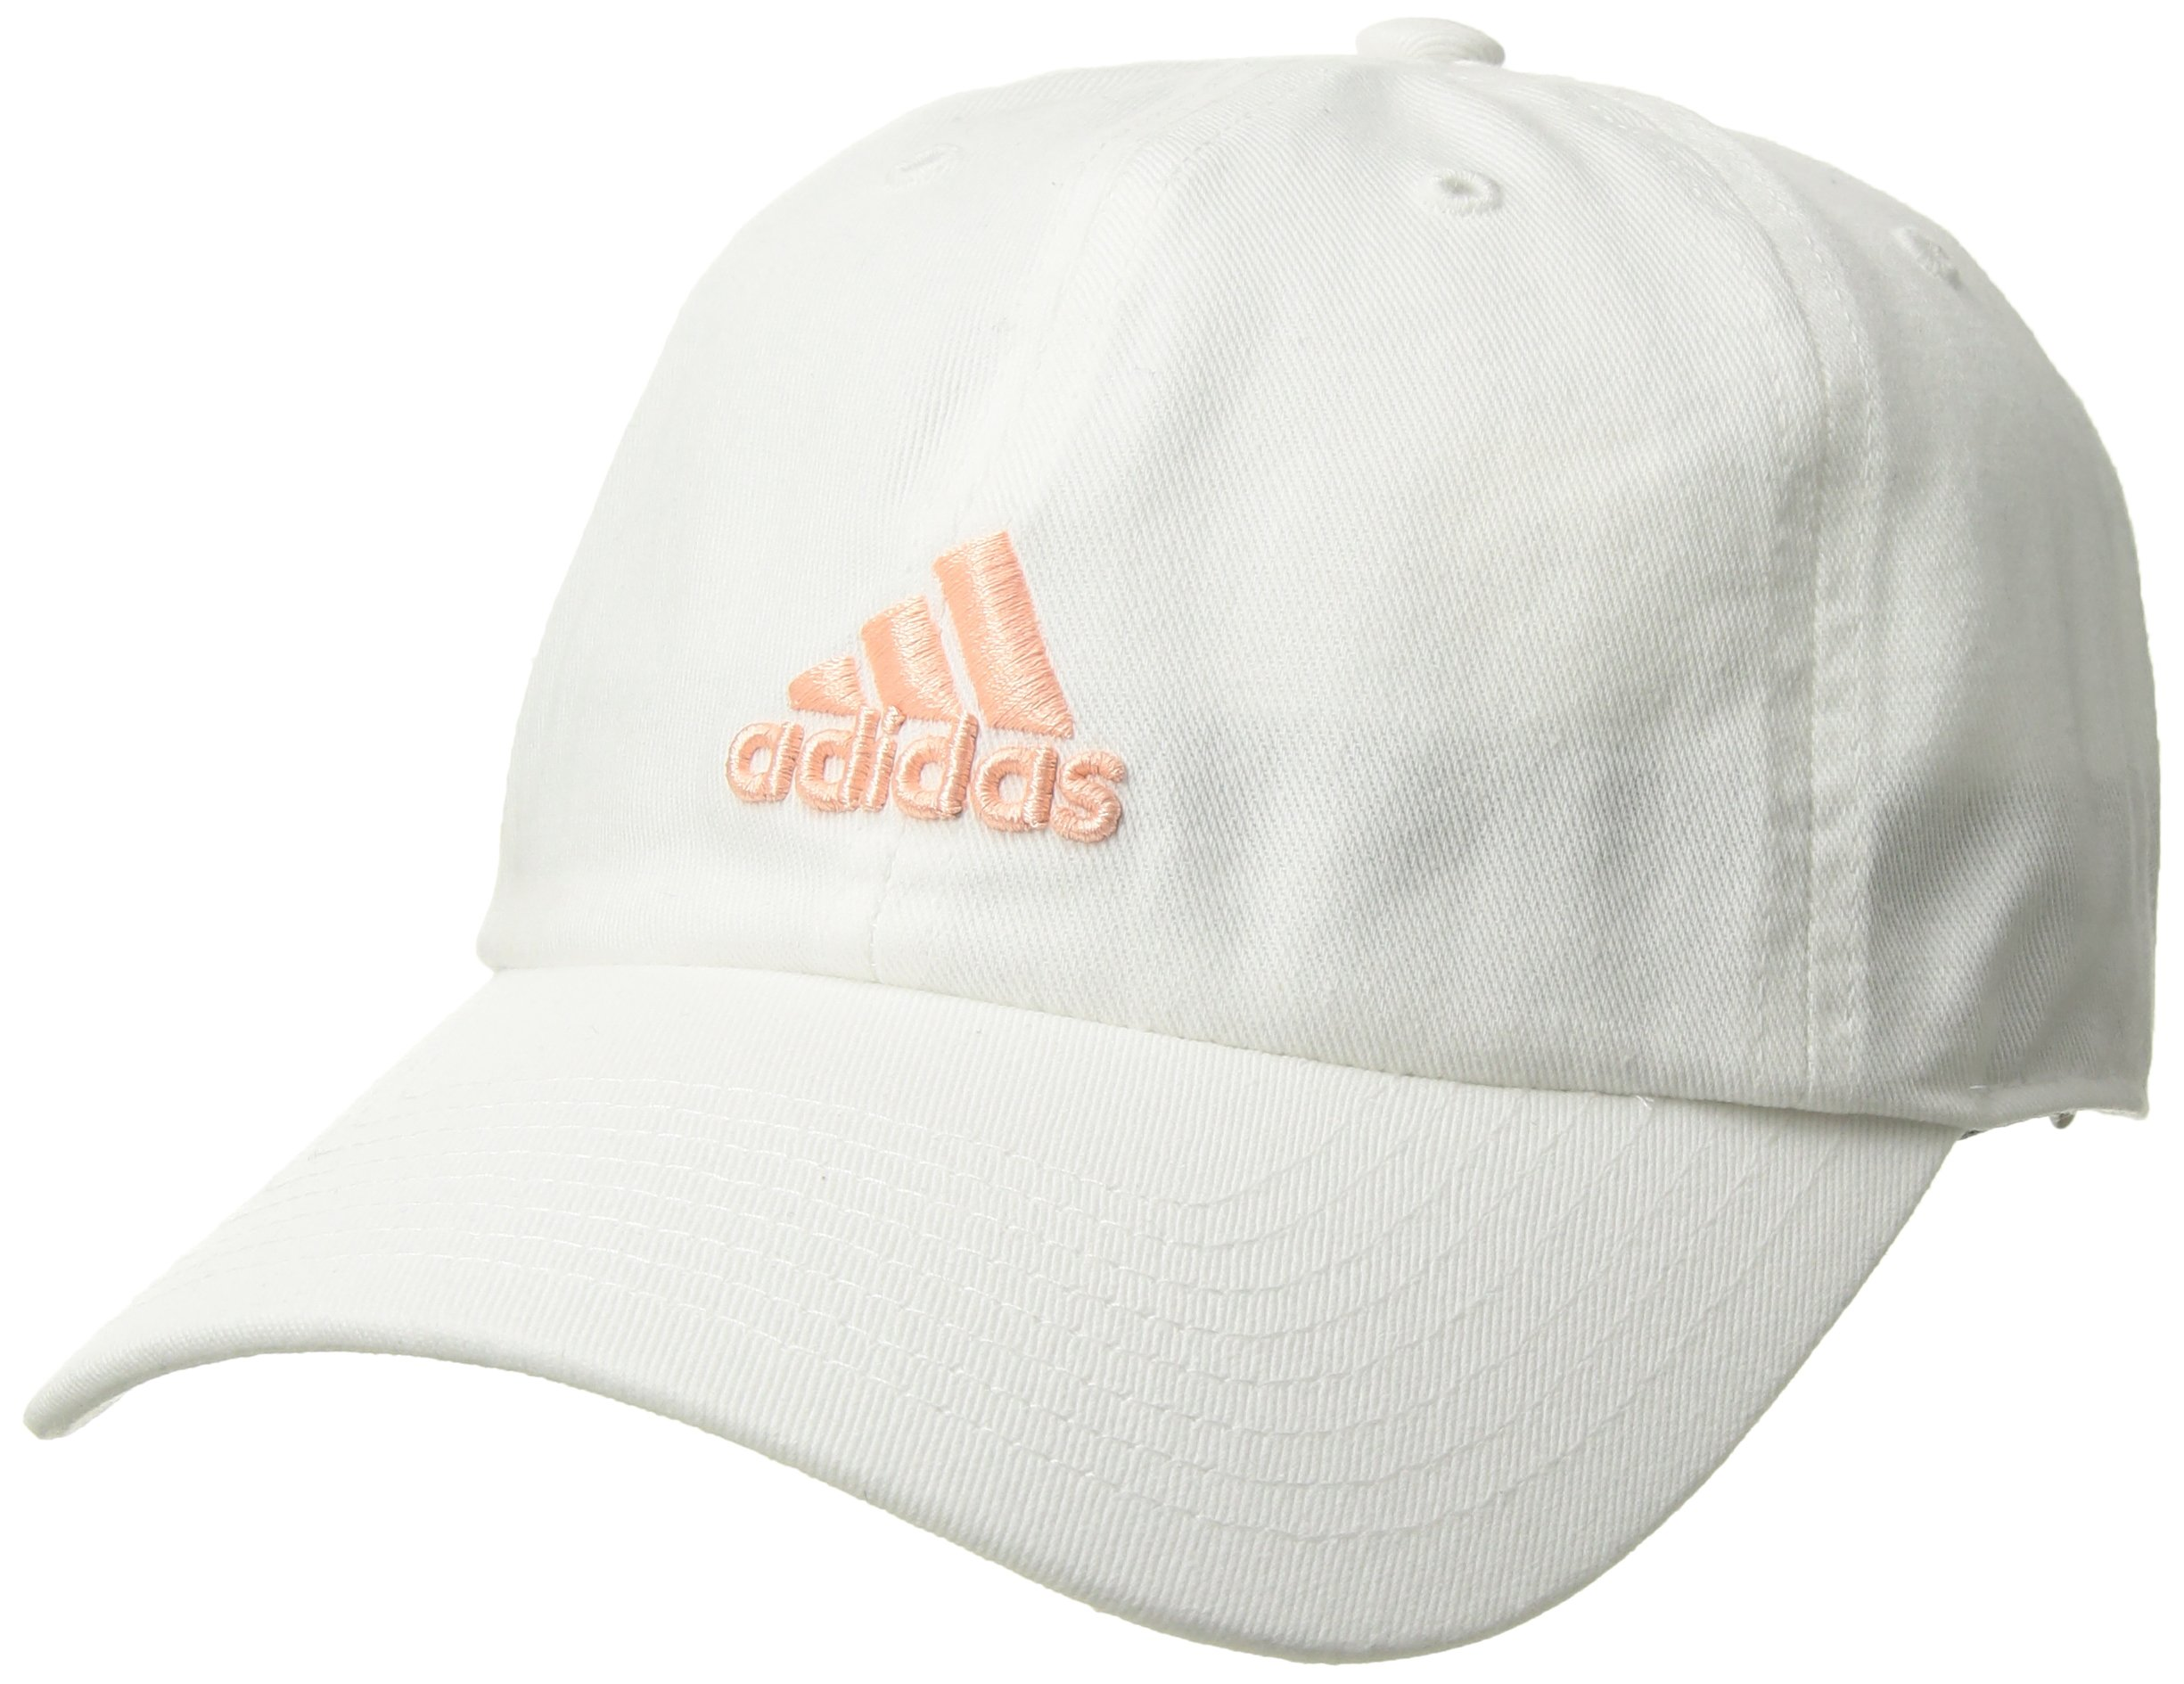 adidas Womens Saturday Cap, White/Haze Coral, One Size